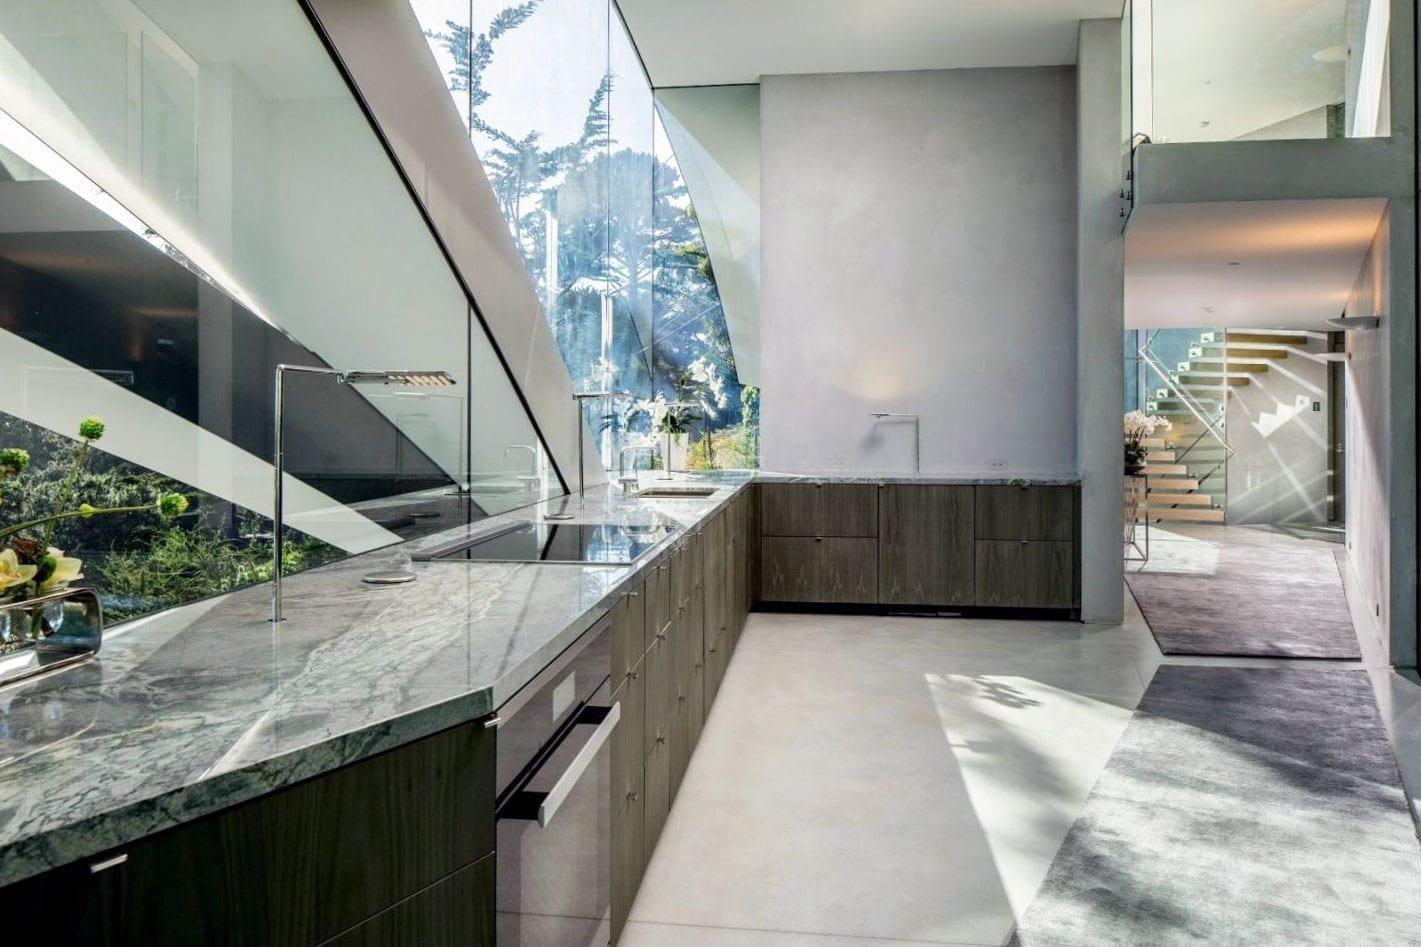 Interior stainless steel fascia divides the kitchen fenestration.